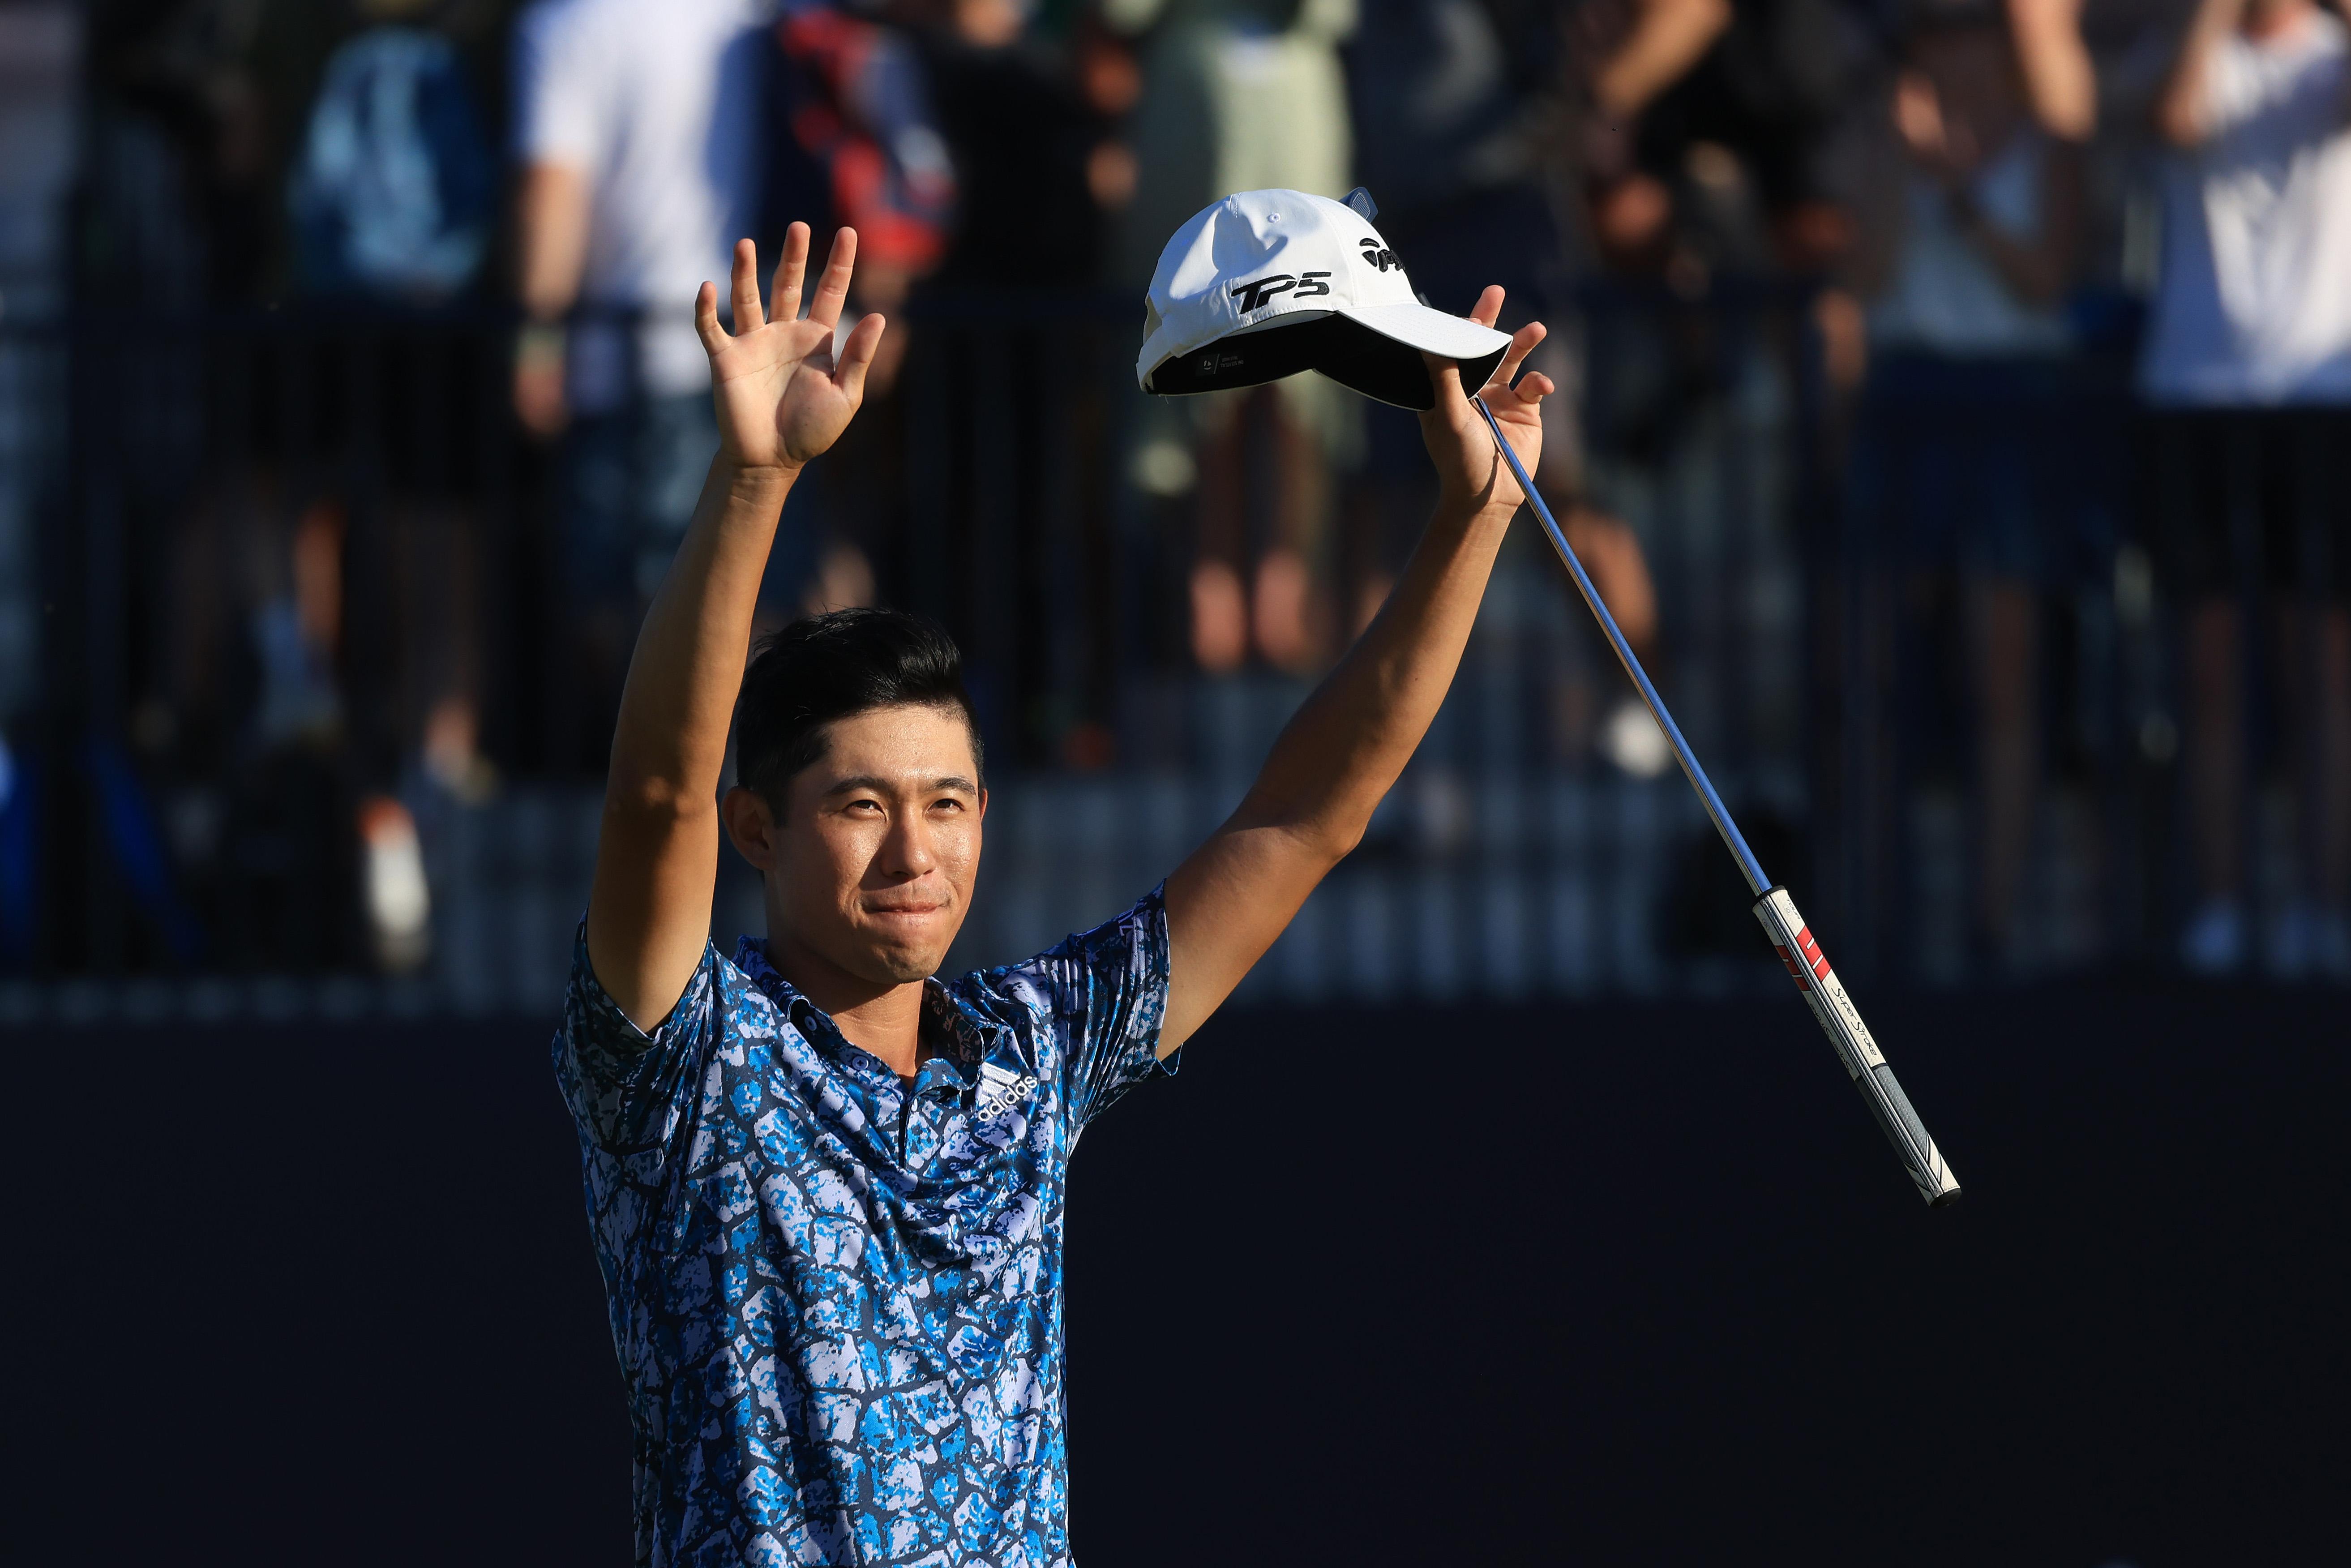 Collin Morikawa celebrates winning the Open